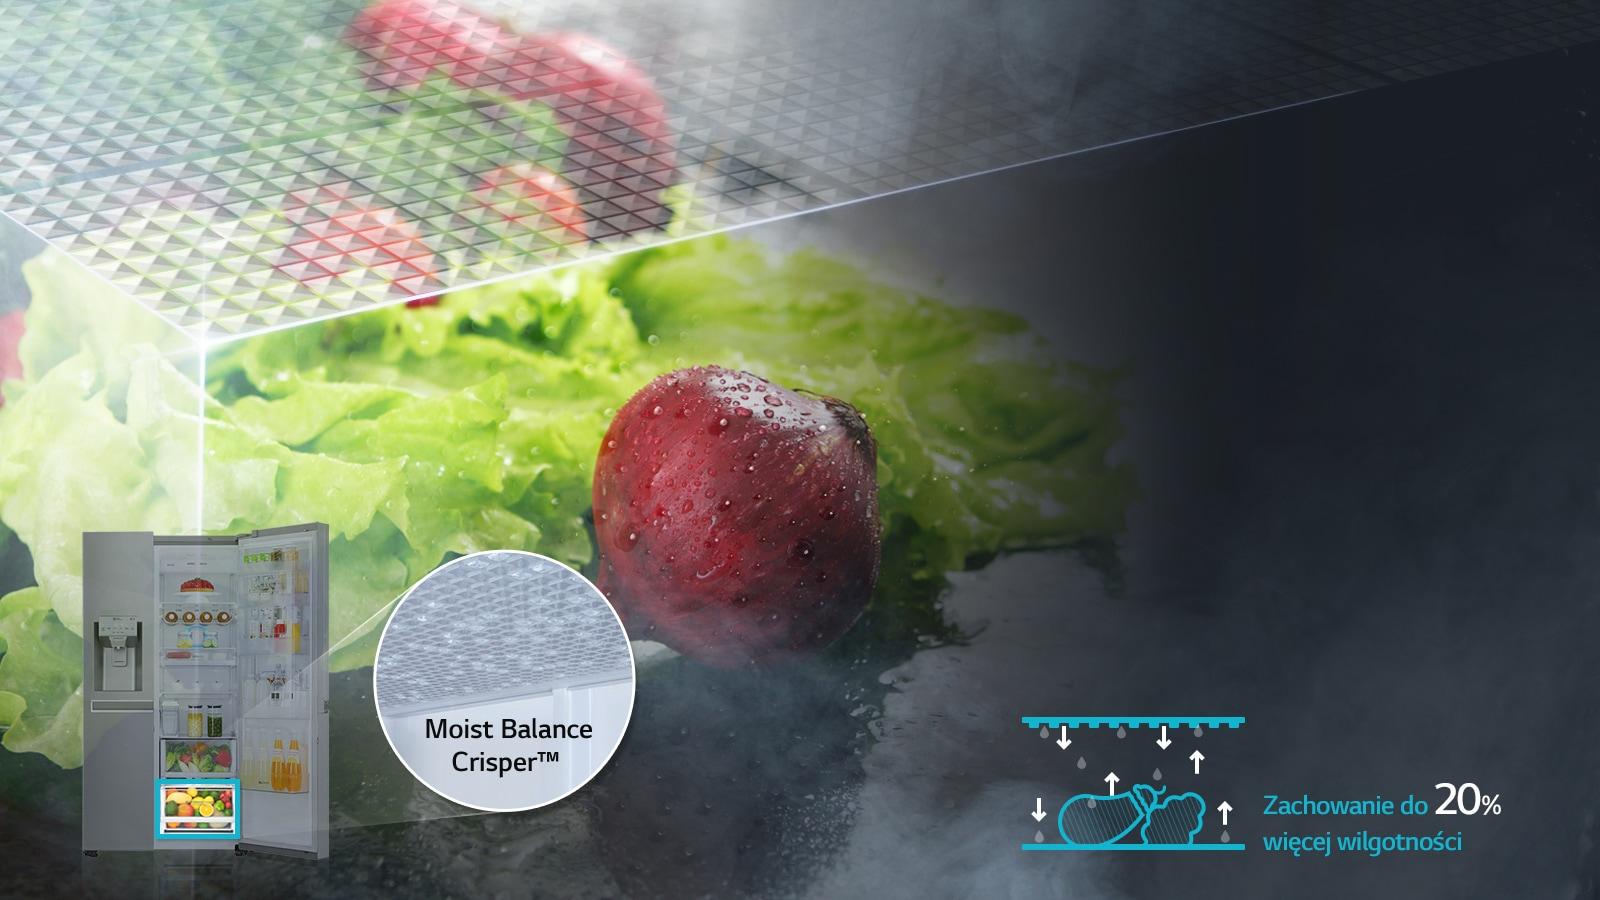 Moist Balance Crisper™3